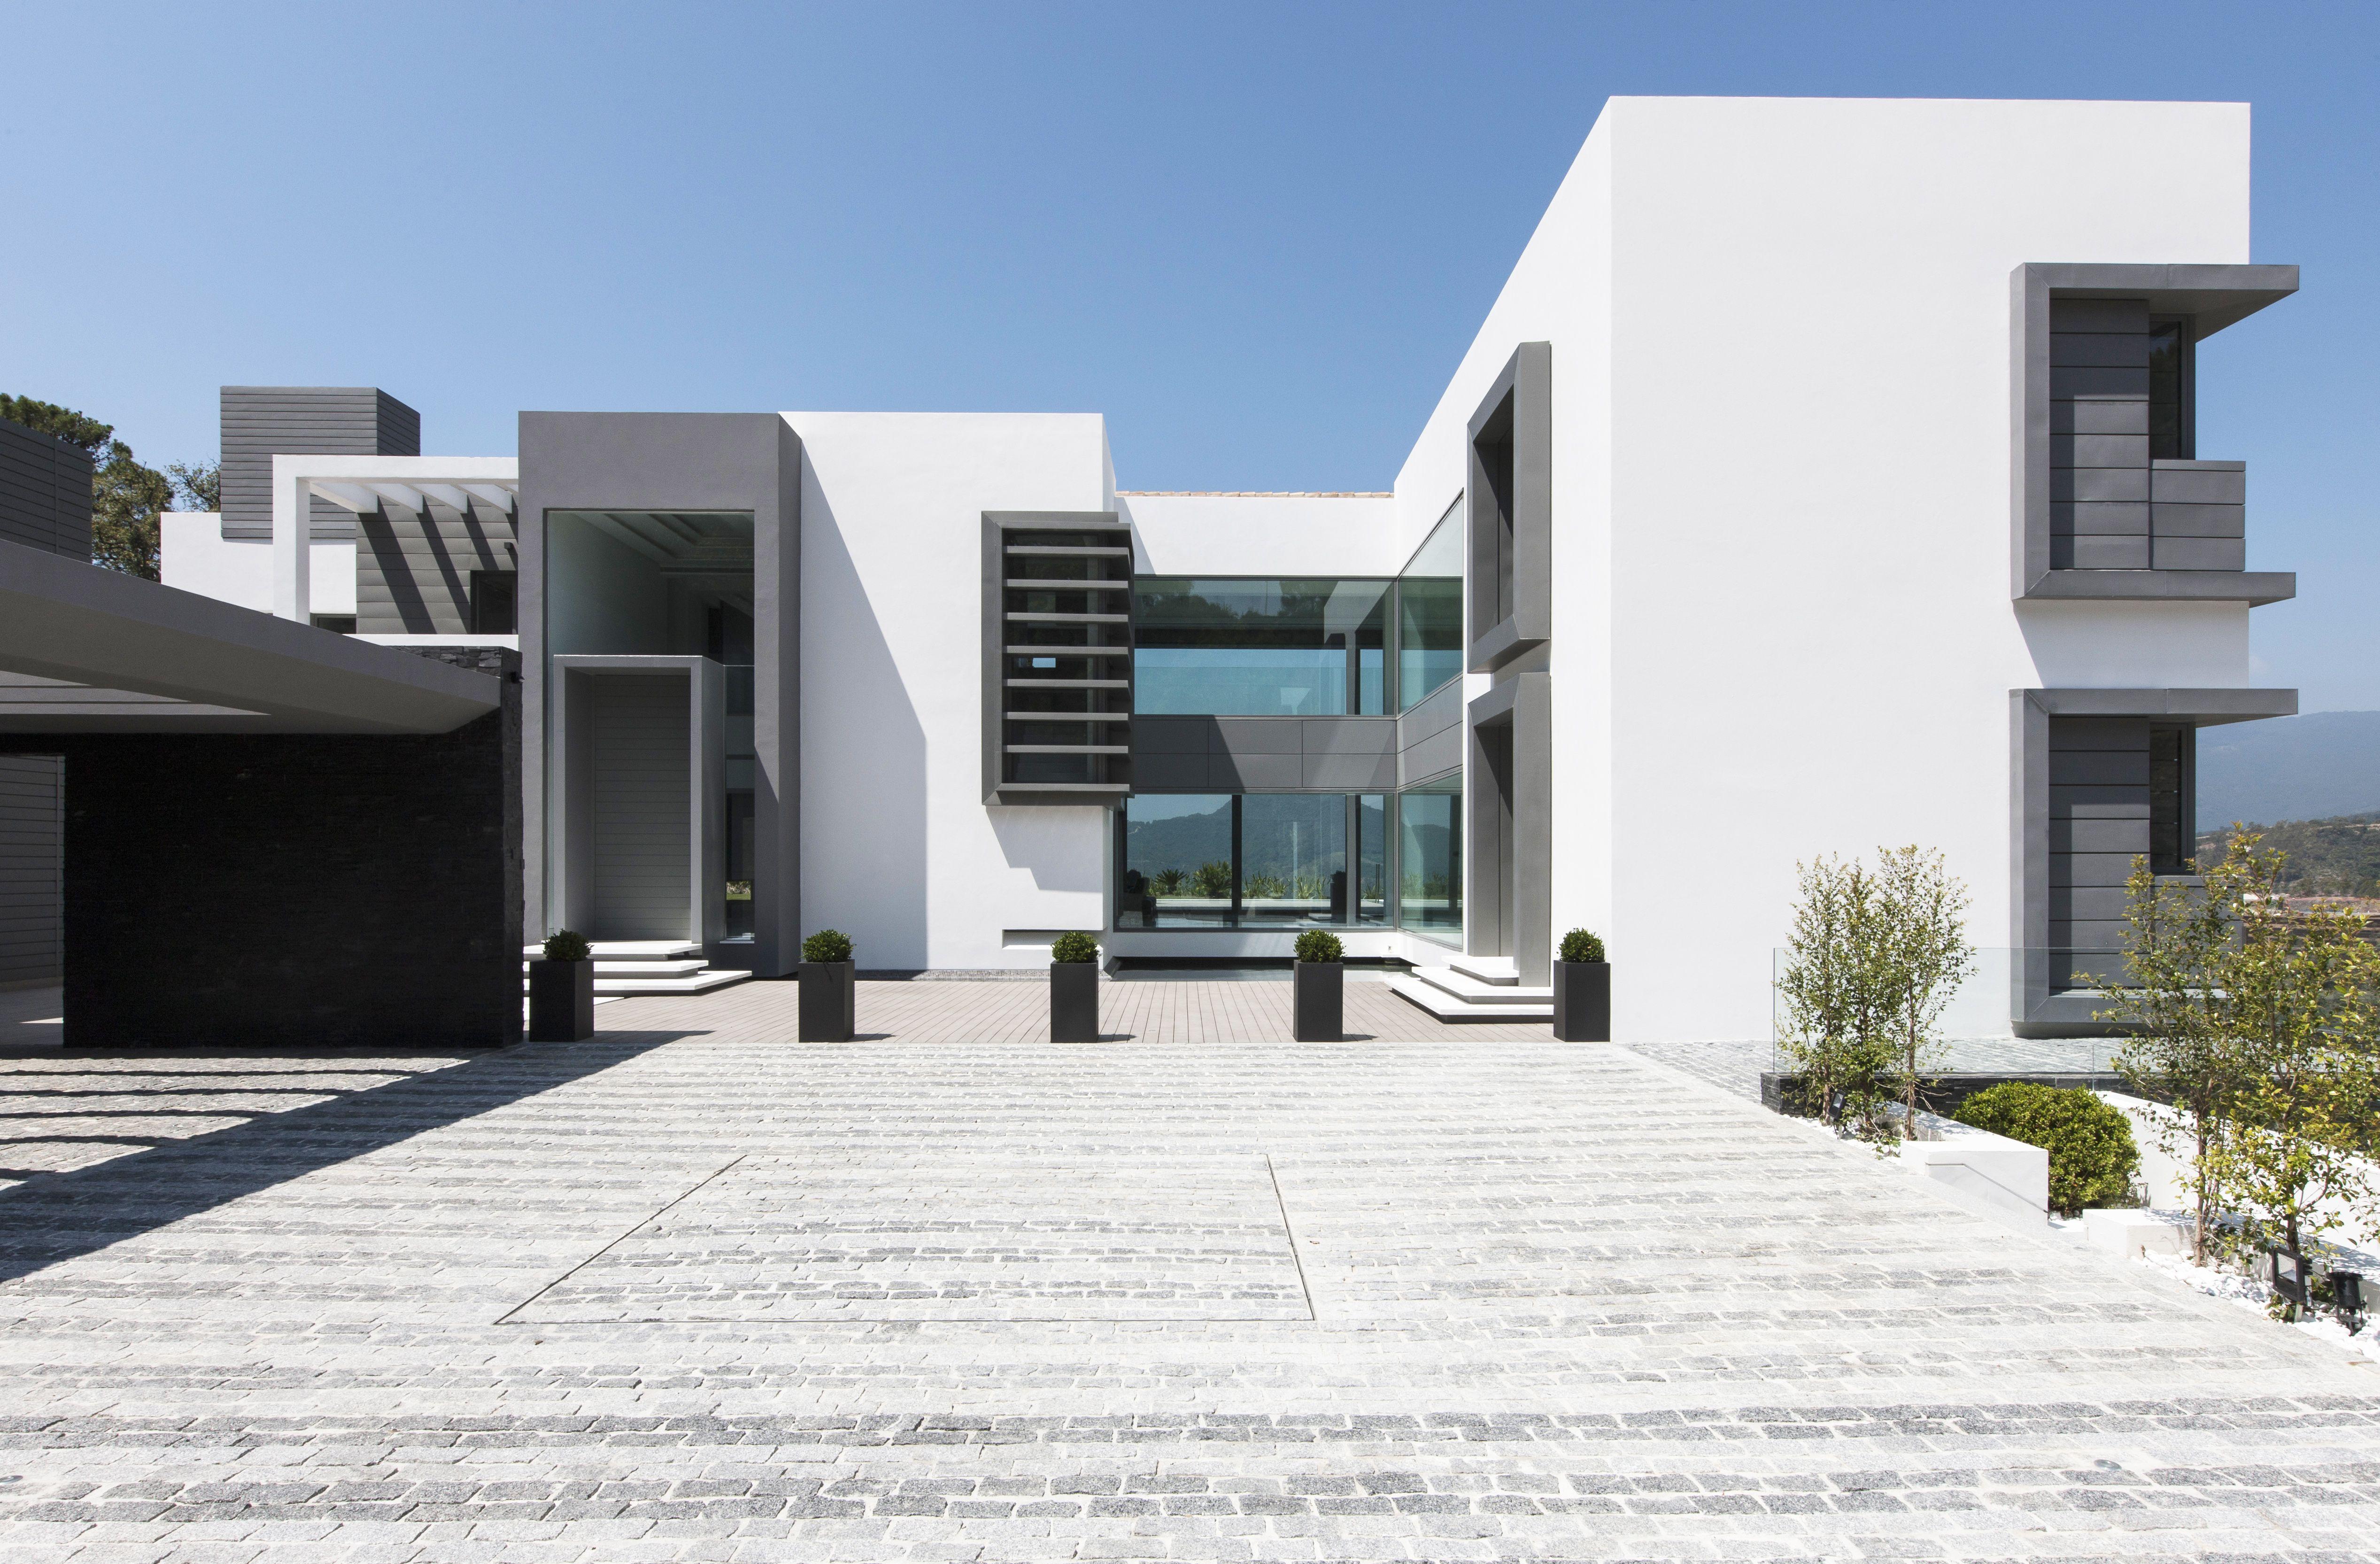 villa arcadio r sidence la zagaleta marbella espagne. Black Bedroom Furniture Sets. Home Design Ideas